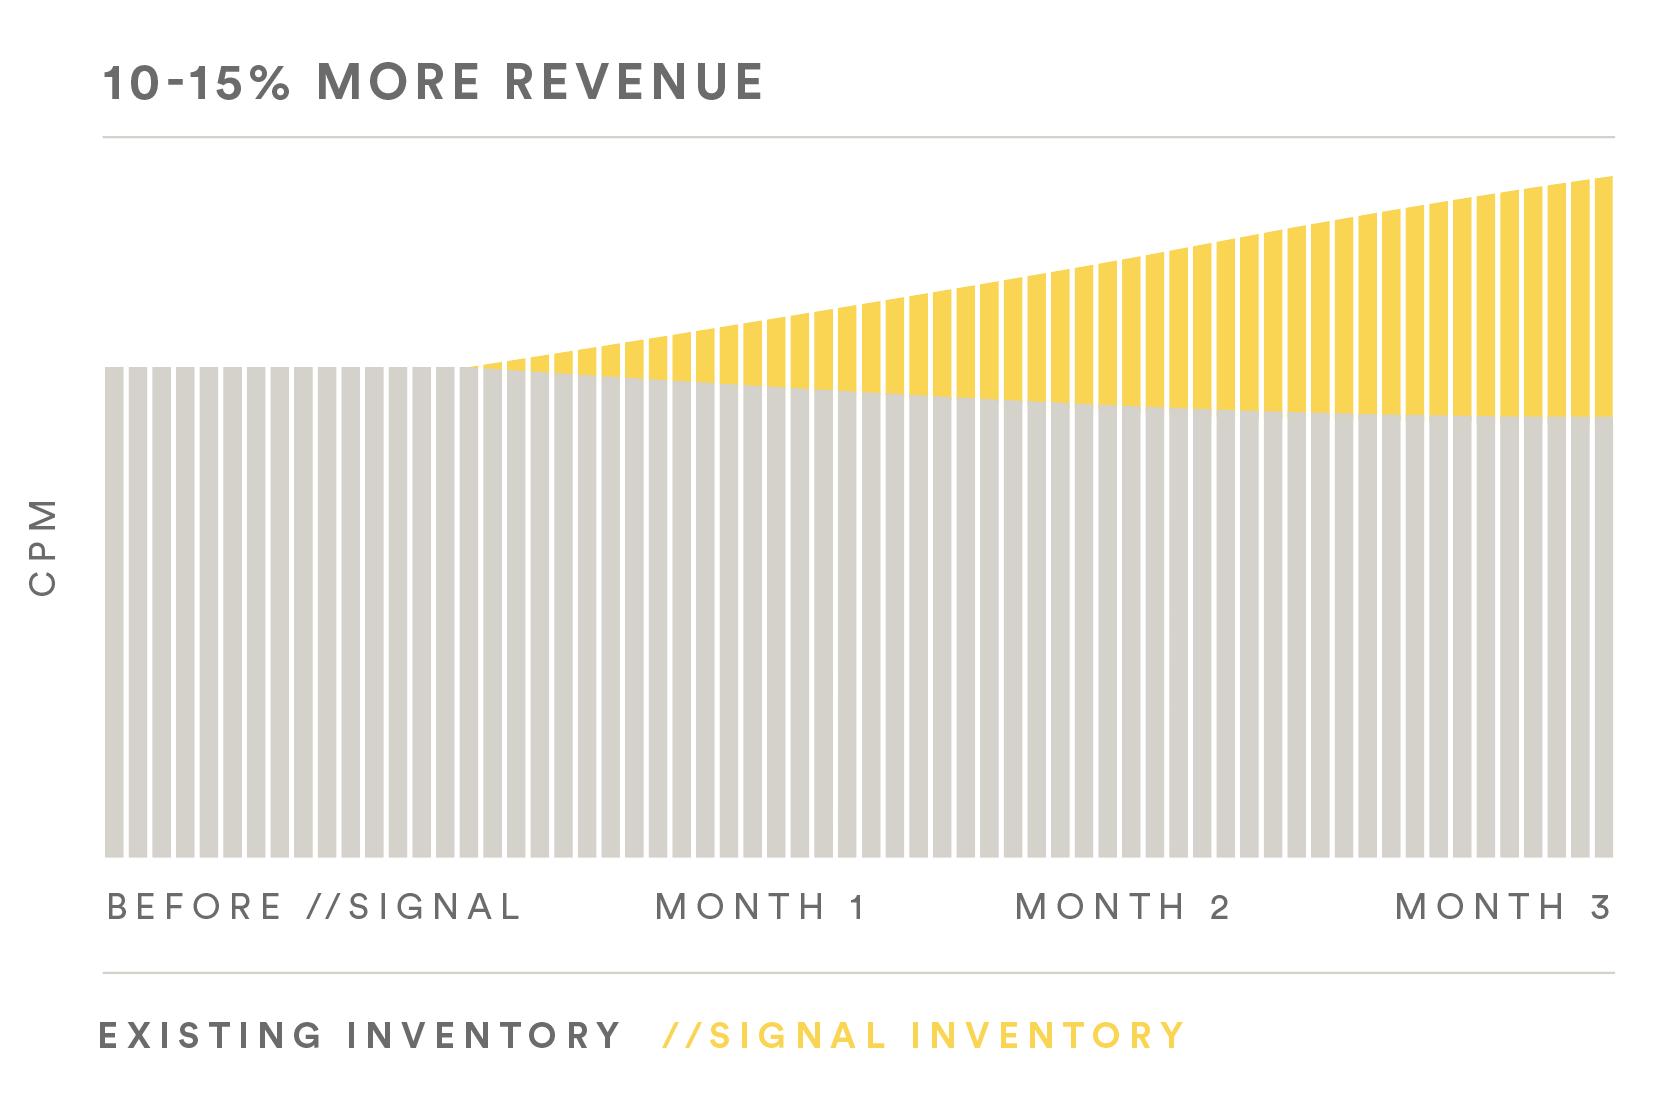 sovrn-signal-revenue-increase